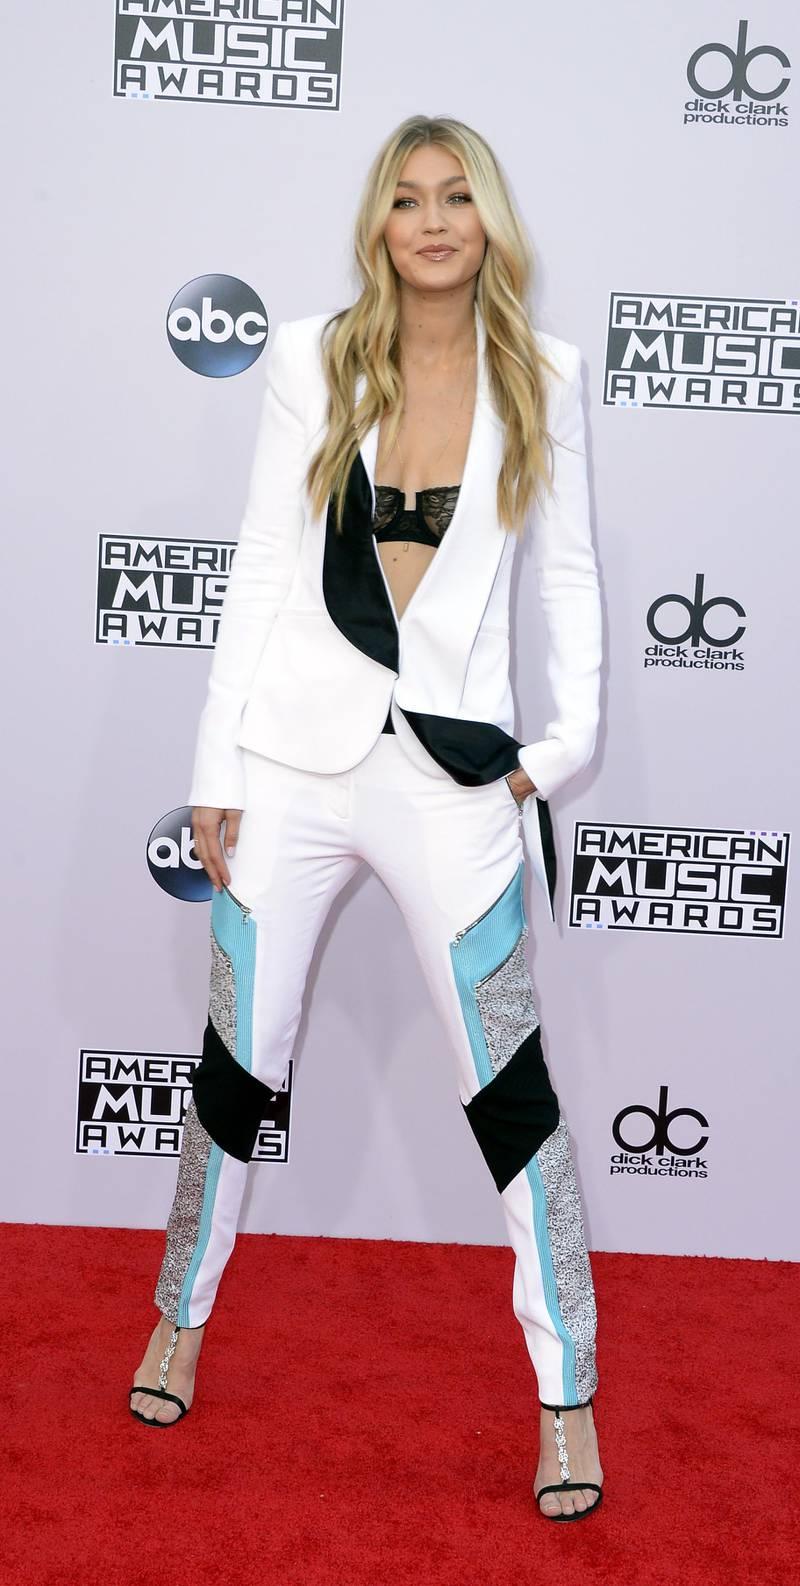 epa04501660 Model Gigi Hadid arrives for the 2014 American Music Awards at the Nokia Theatre in Los Angeles, California, USA, 23 November 2014.  EPA/PAUL BUCK